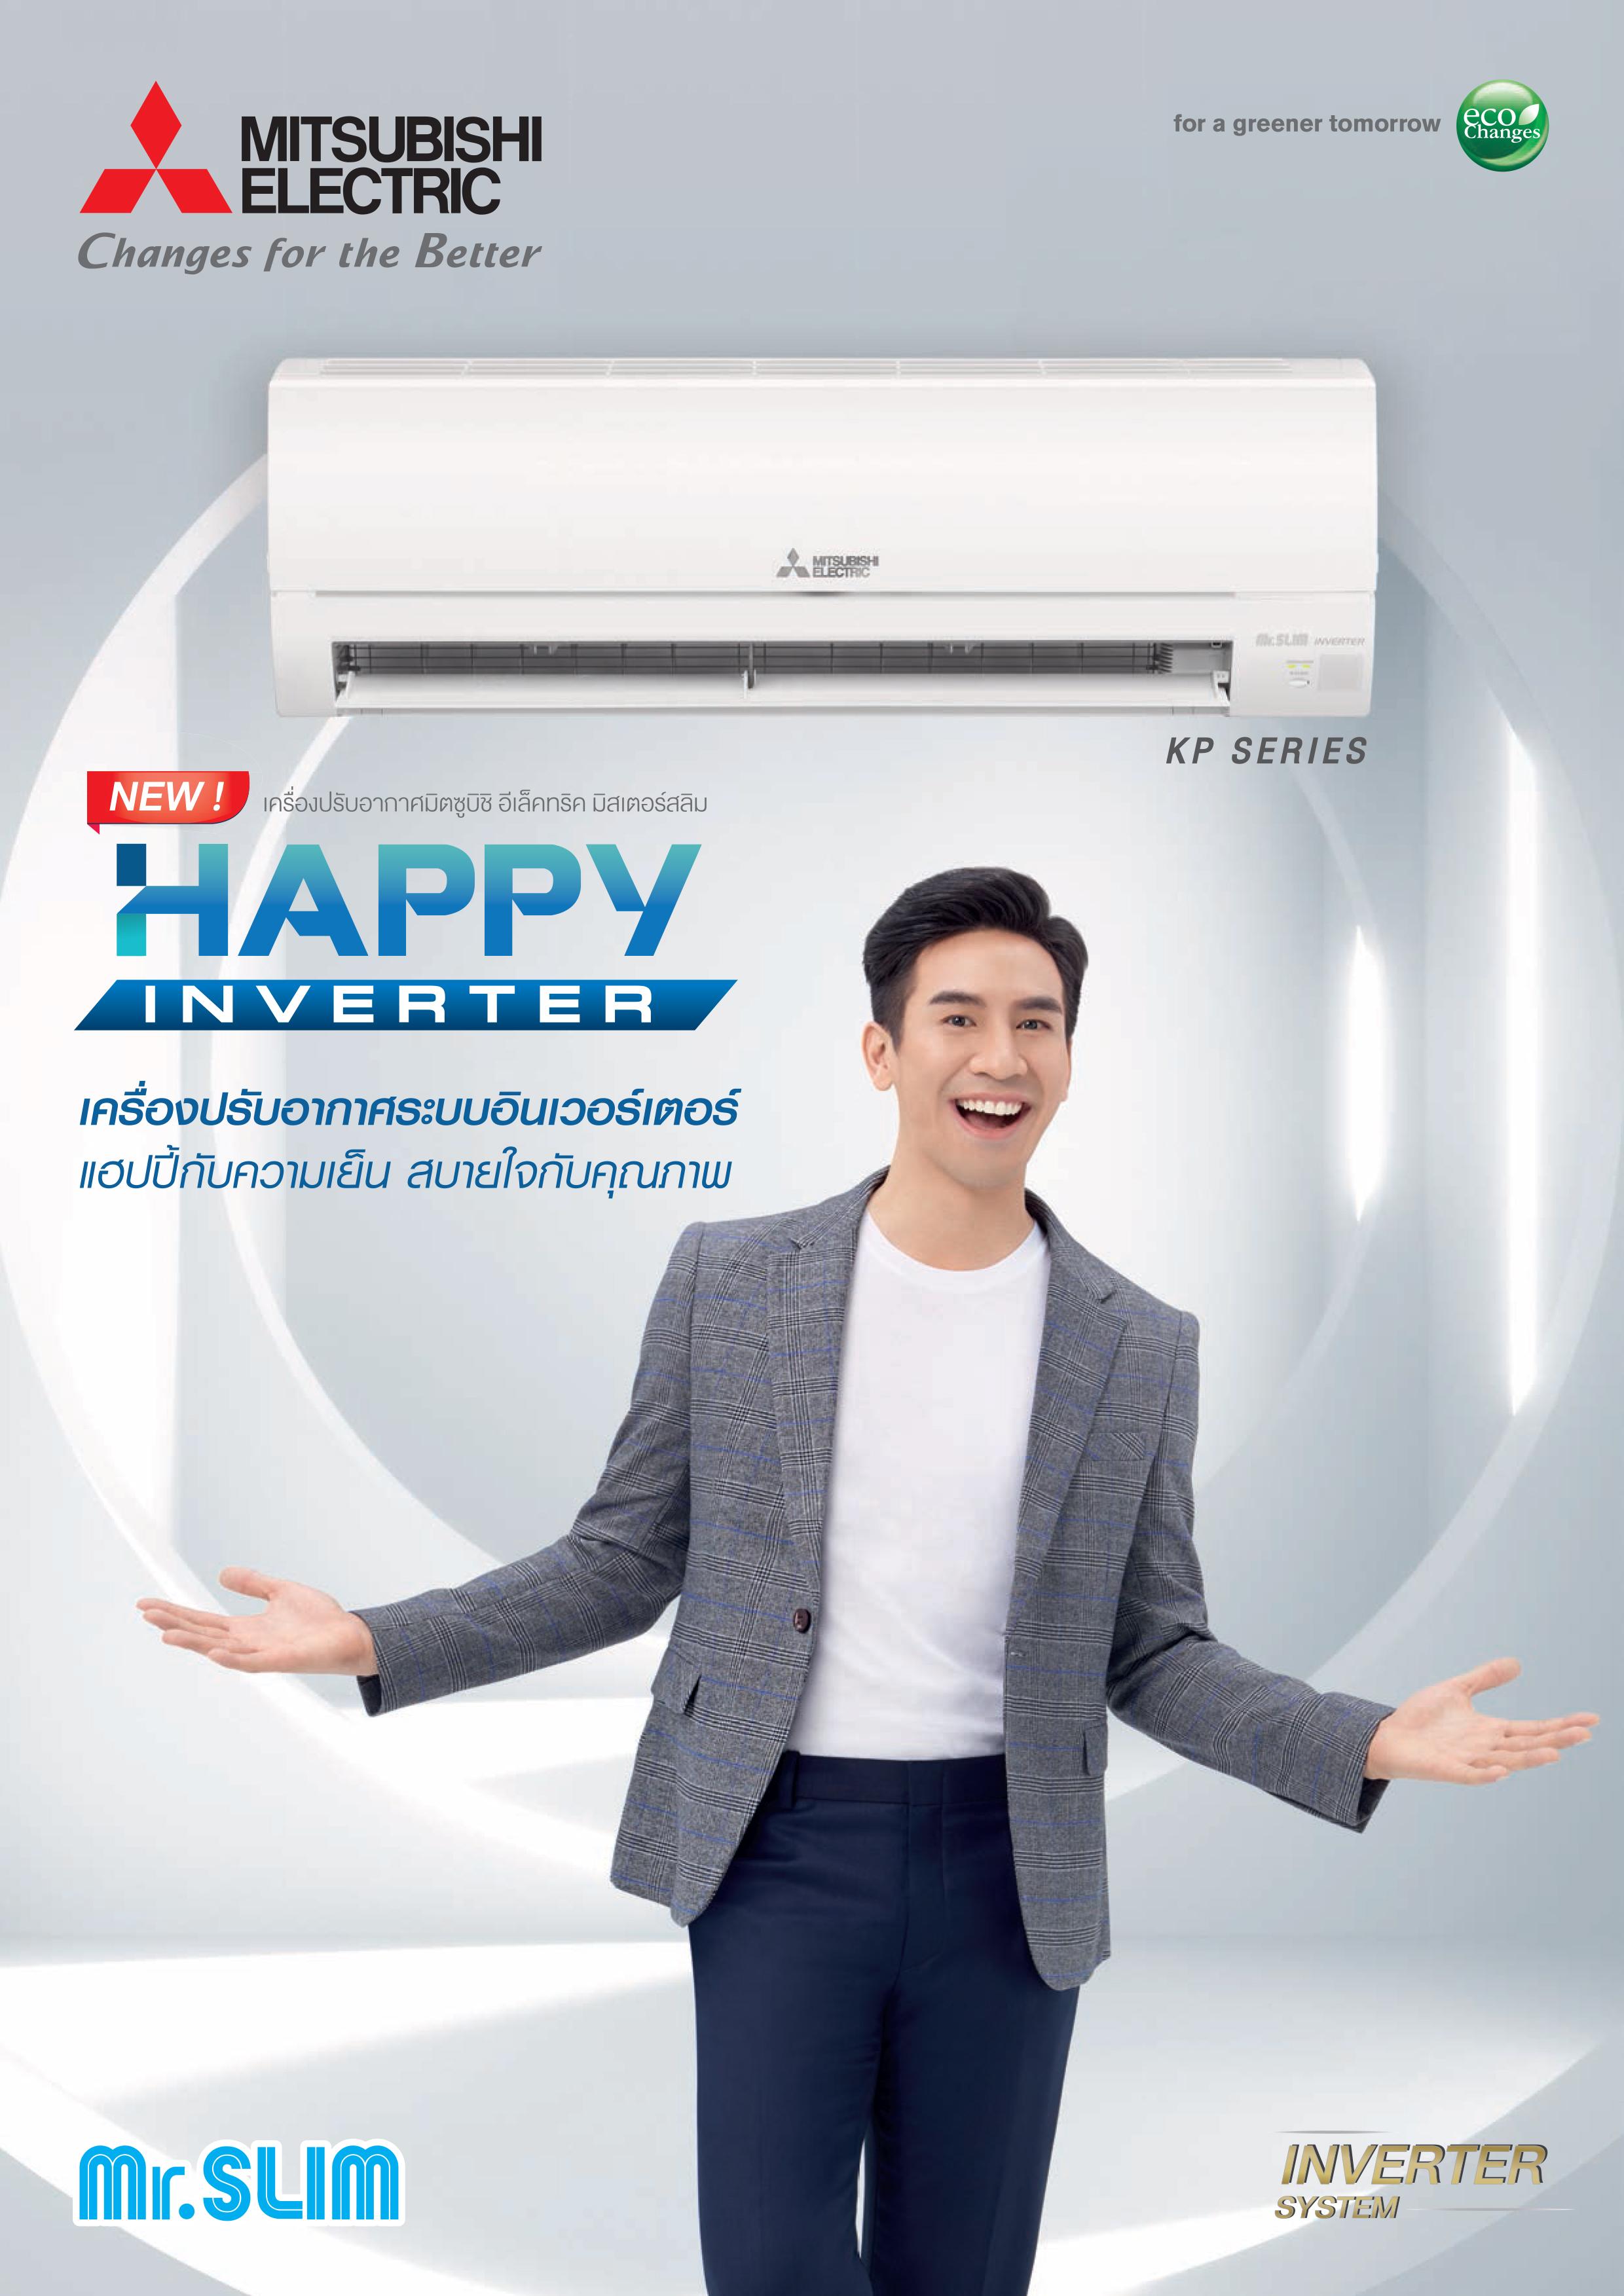 AIR MITSUBISHI ELECTRICรุ่นHAPPY-KP-SERIES